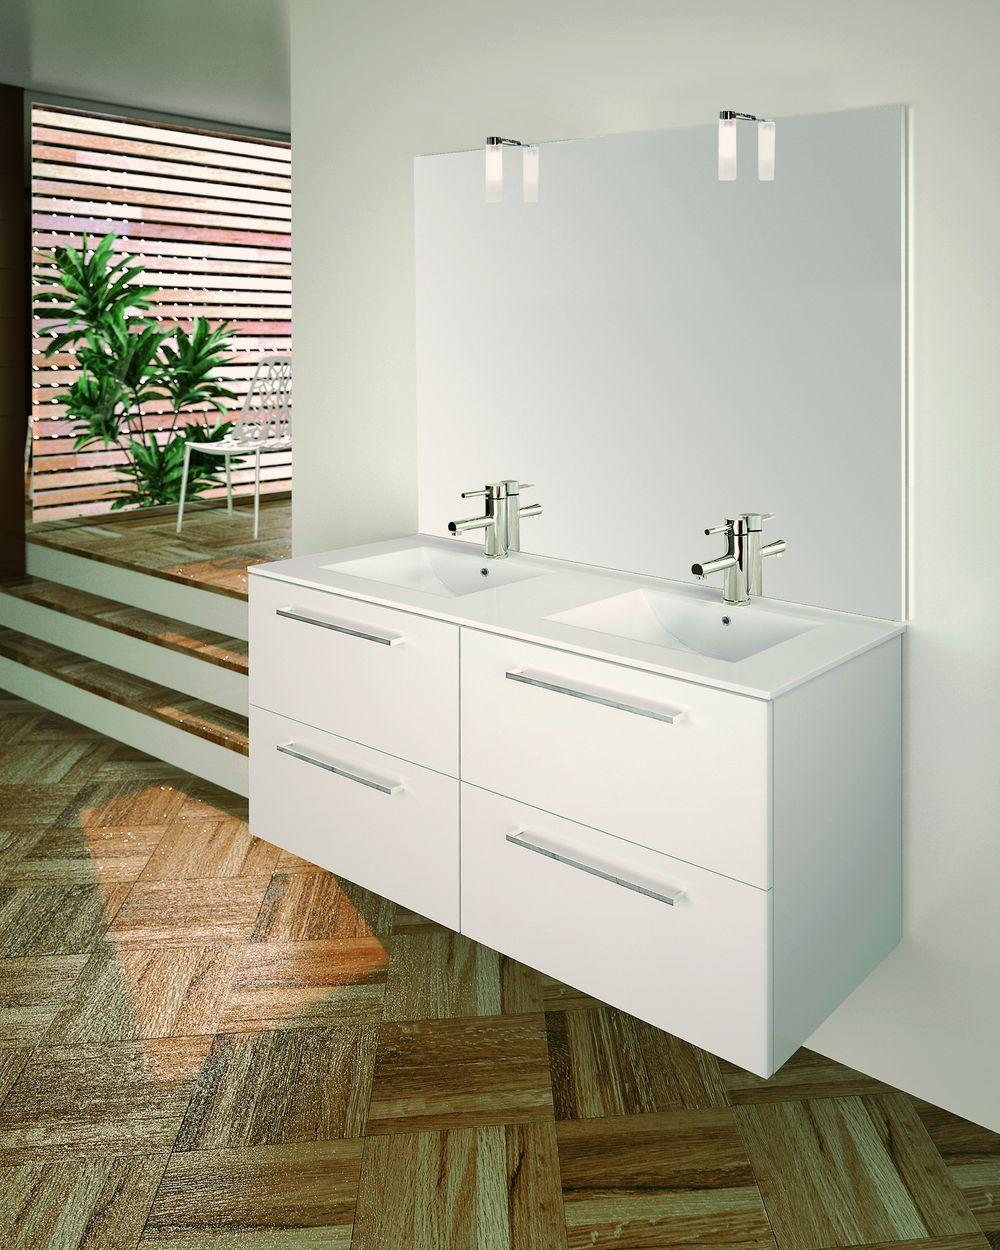 Faience Salle De Bain Tunisie ~ meuble salle de bain saphir vm am nagement salle de bain